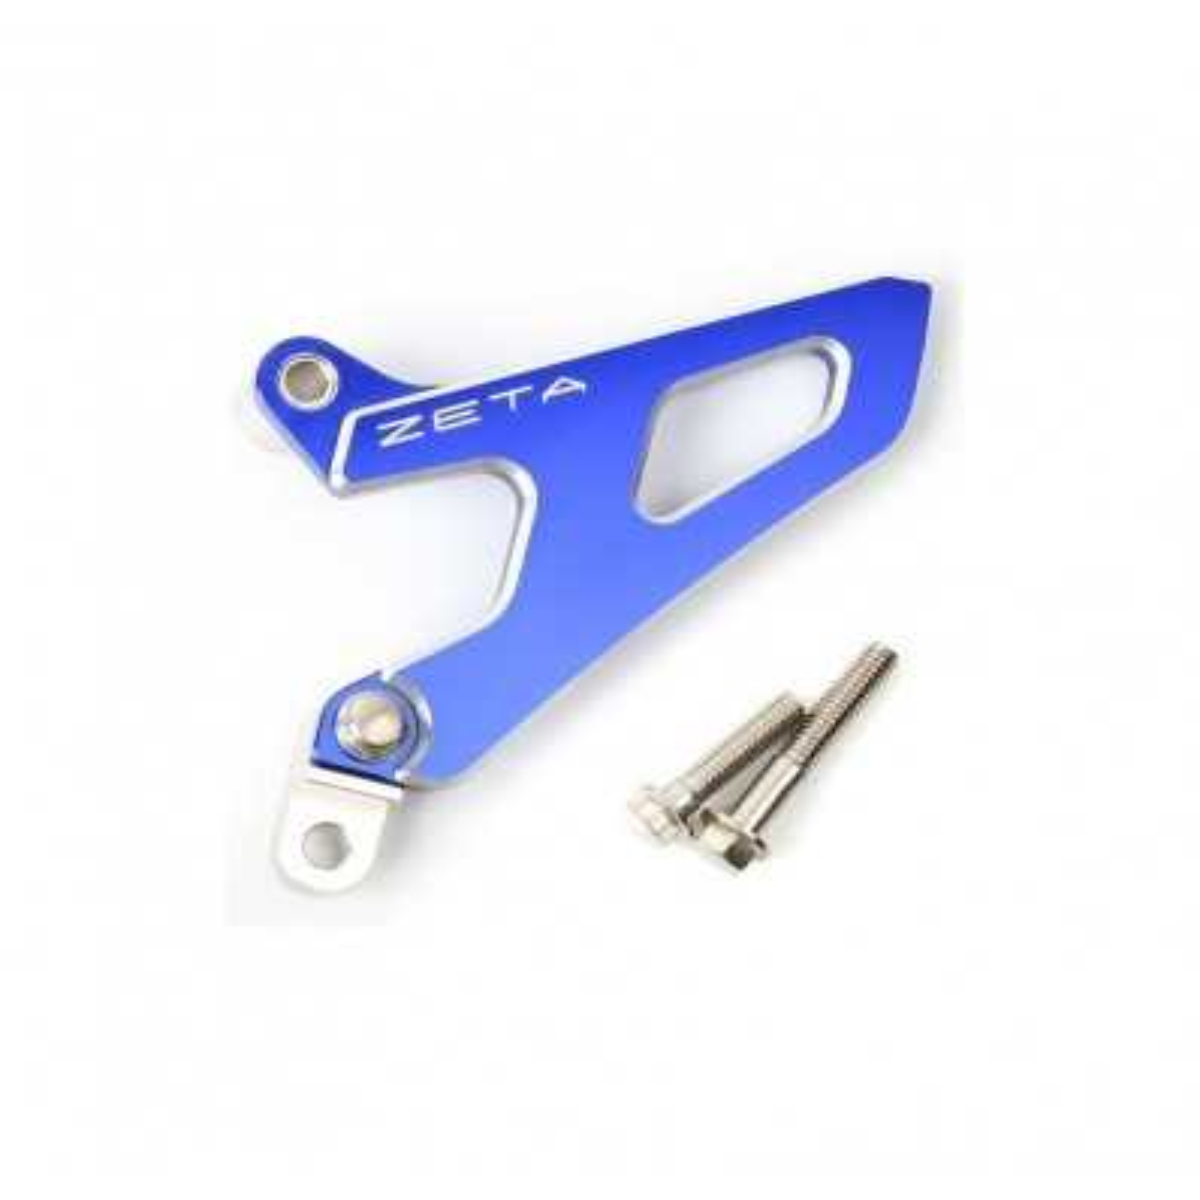 ZE80.9034 - Protector Piñon Salida Zeta Kx250F´04-, Rmz250´04-06 Azul